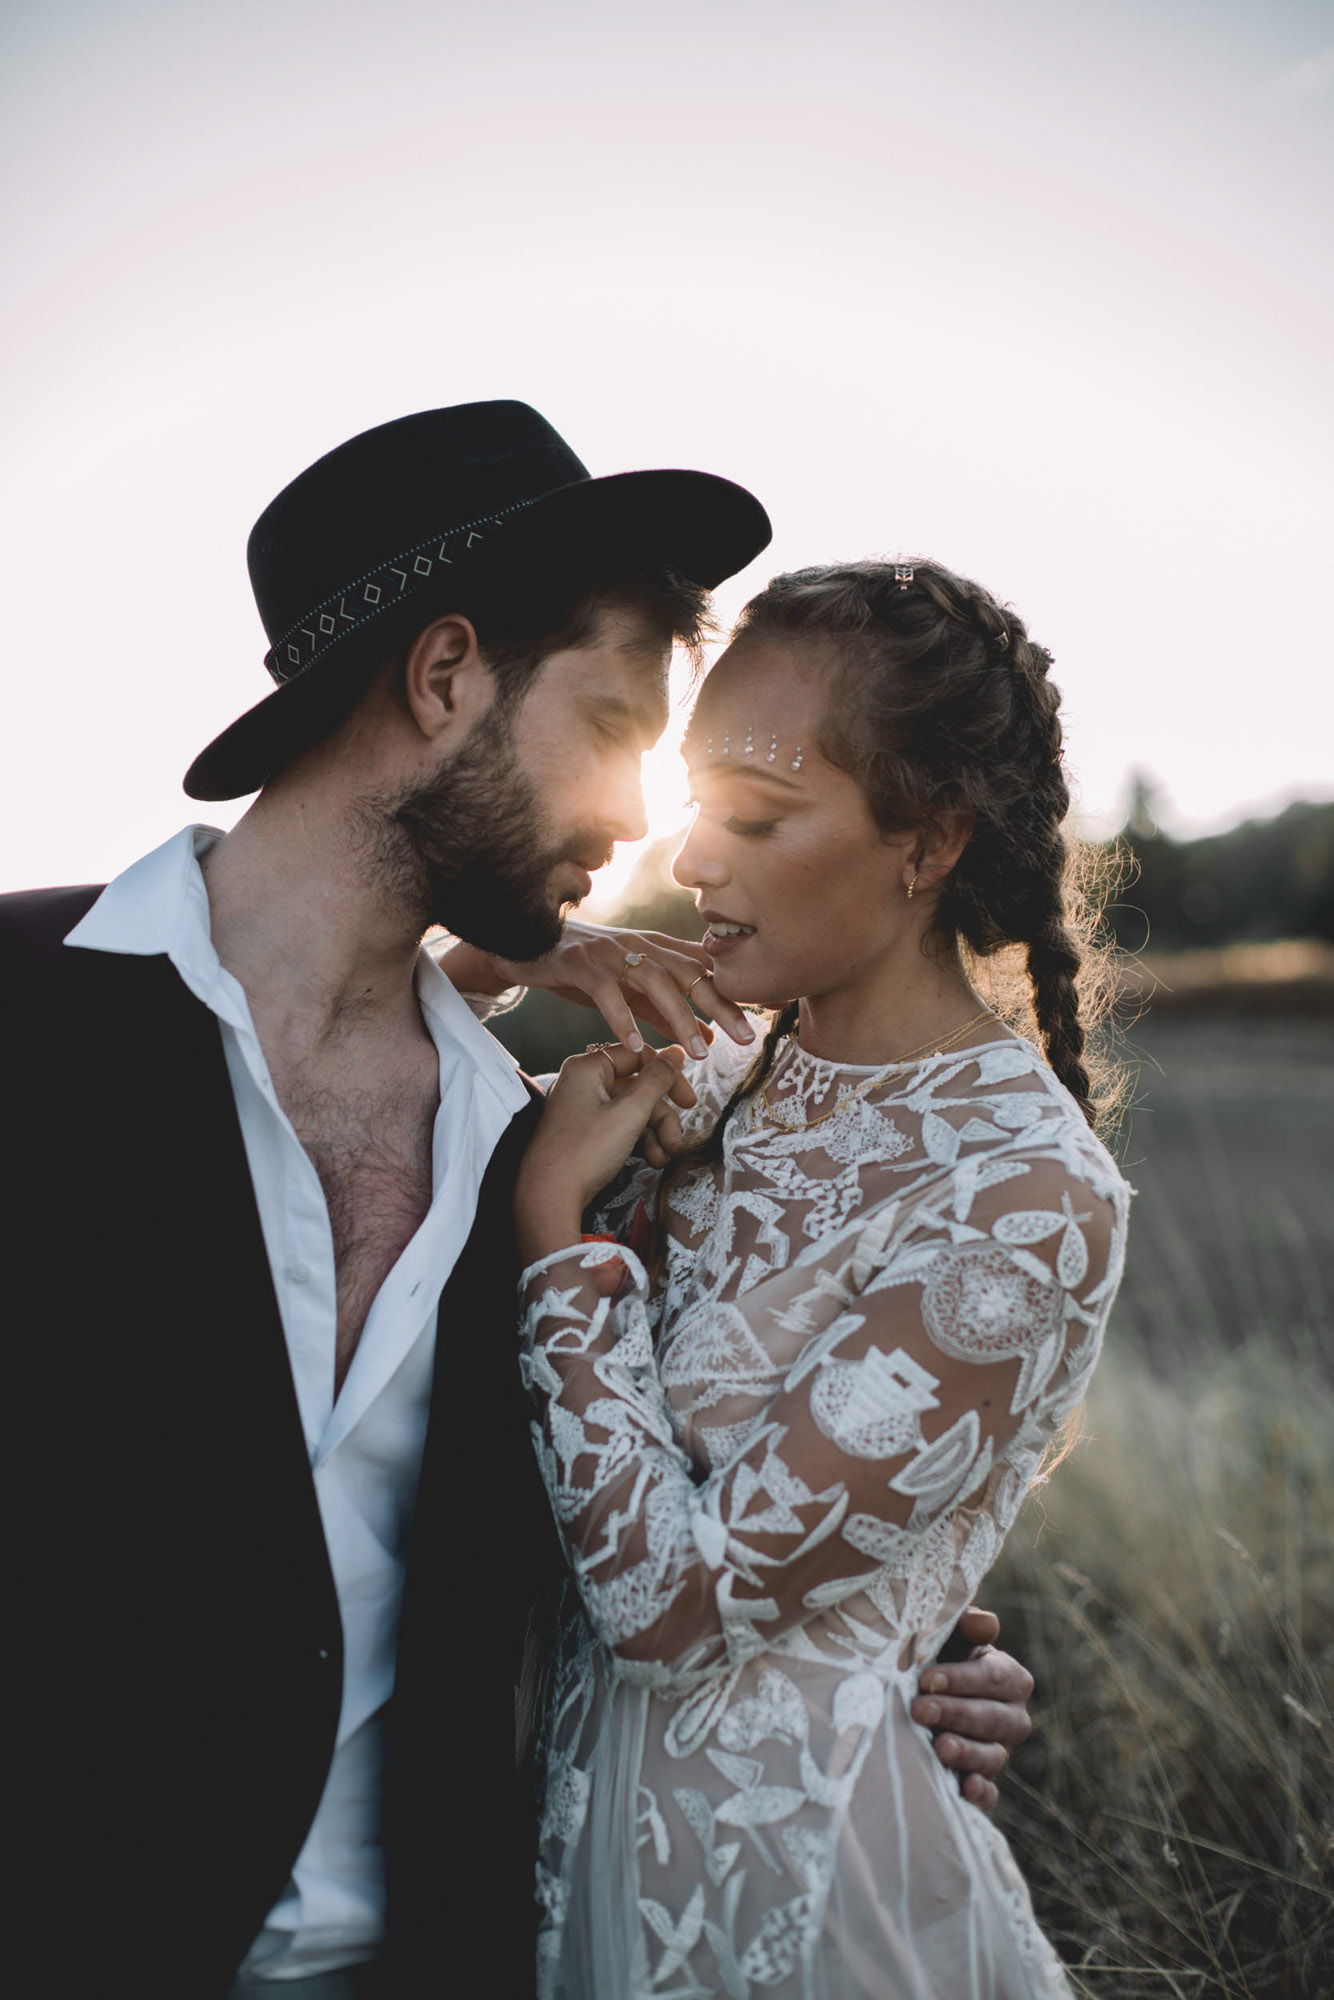 COACHELLA_LES BONNES JOIES_PHOTOGRAPHE_MARIAGE_LES BANDITS-6